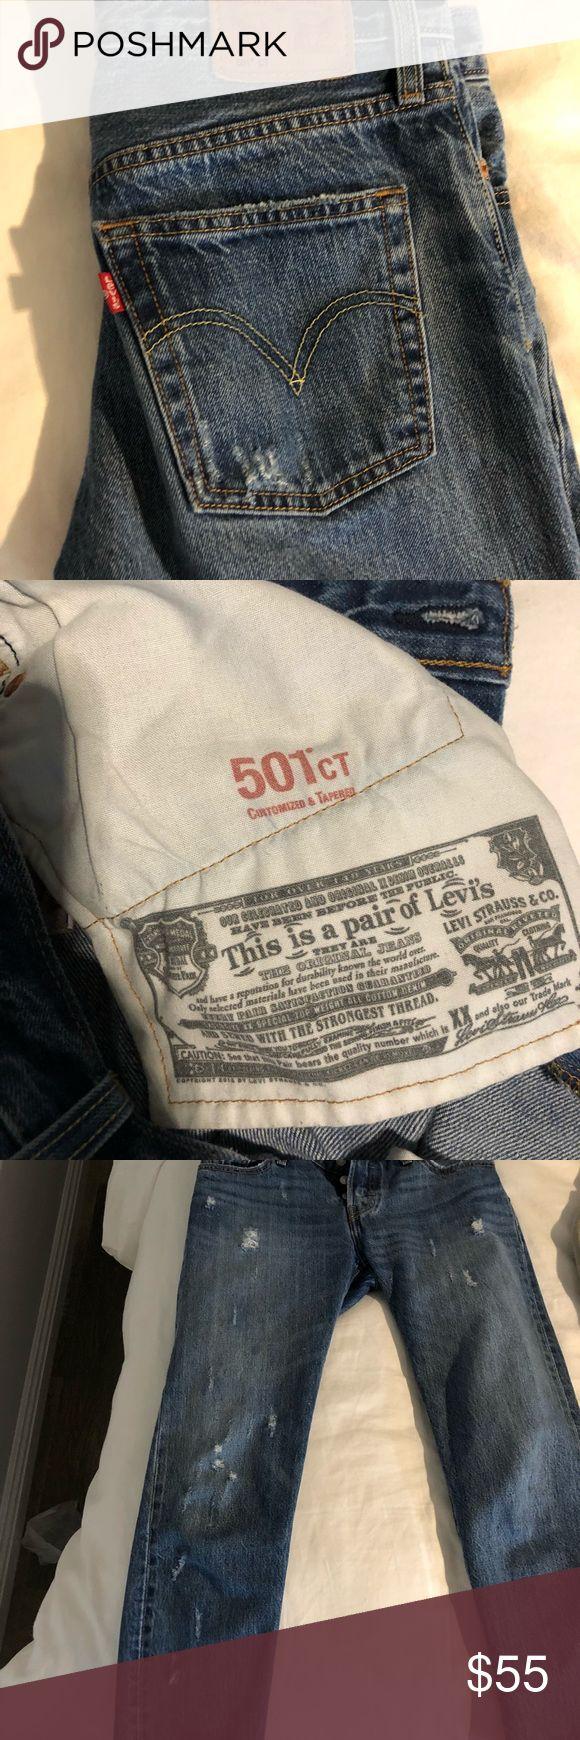 I just added this listing on Poshmark: Levi jeans! 501, worn under 3 times.. #shopmycloset #poshmark #fashion #shopping #style #forsale #Levi's #Denim